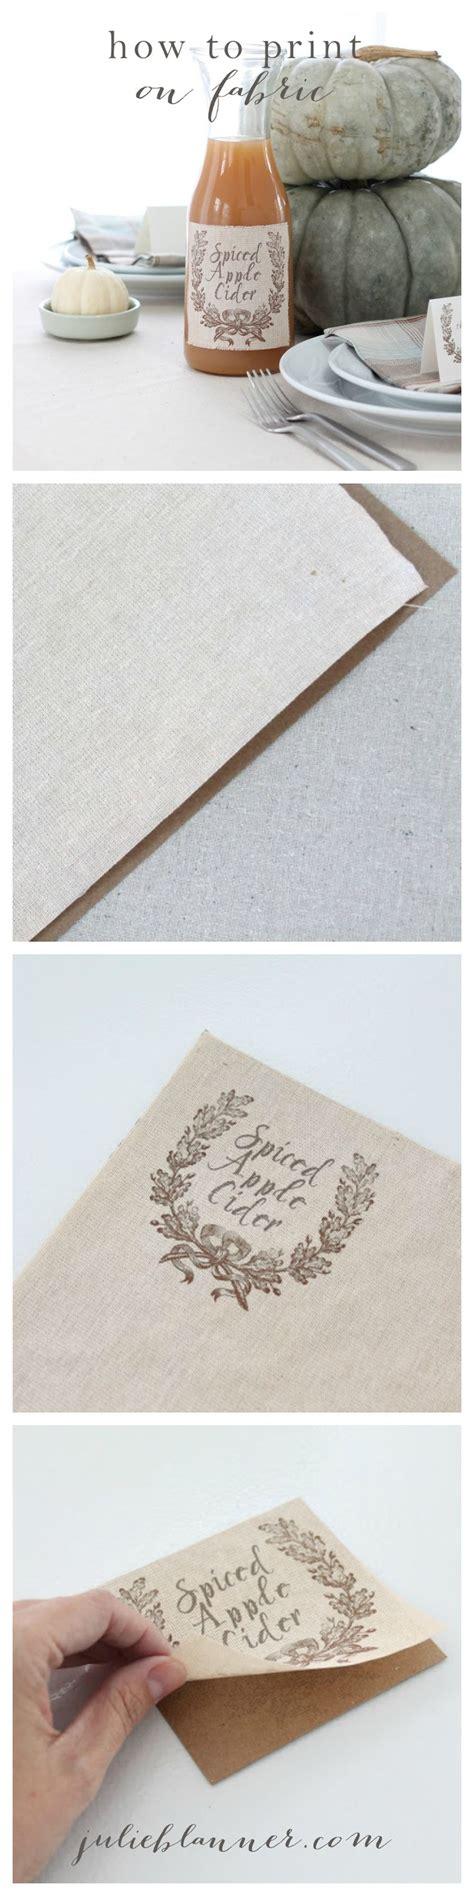 printable fabric tutorial how to print on fabric fabrics tutorials and invitations